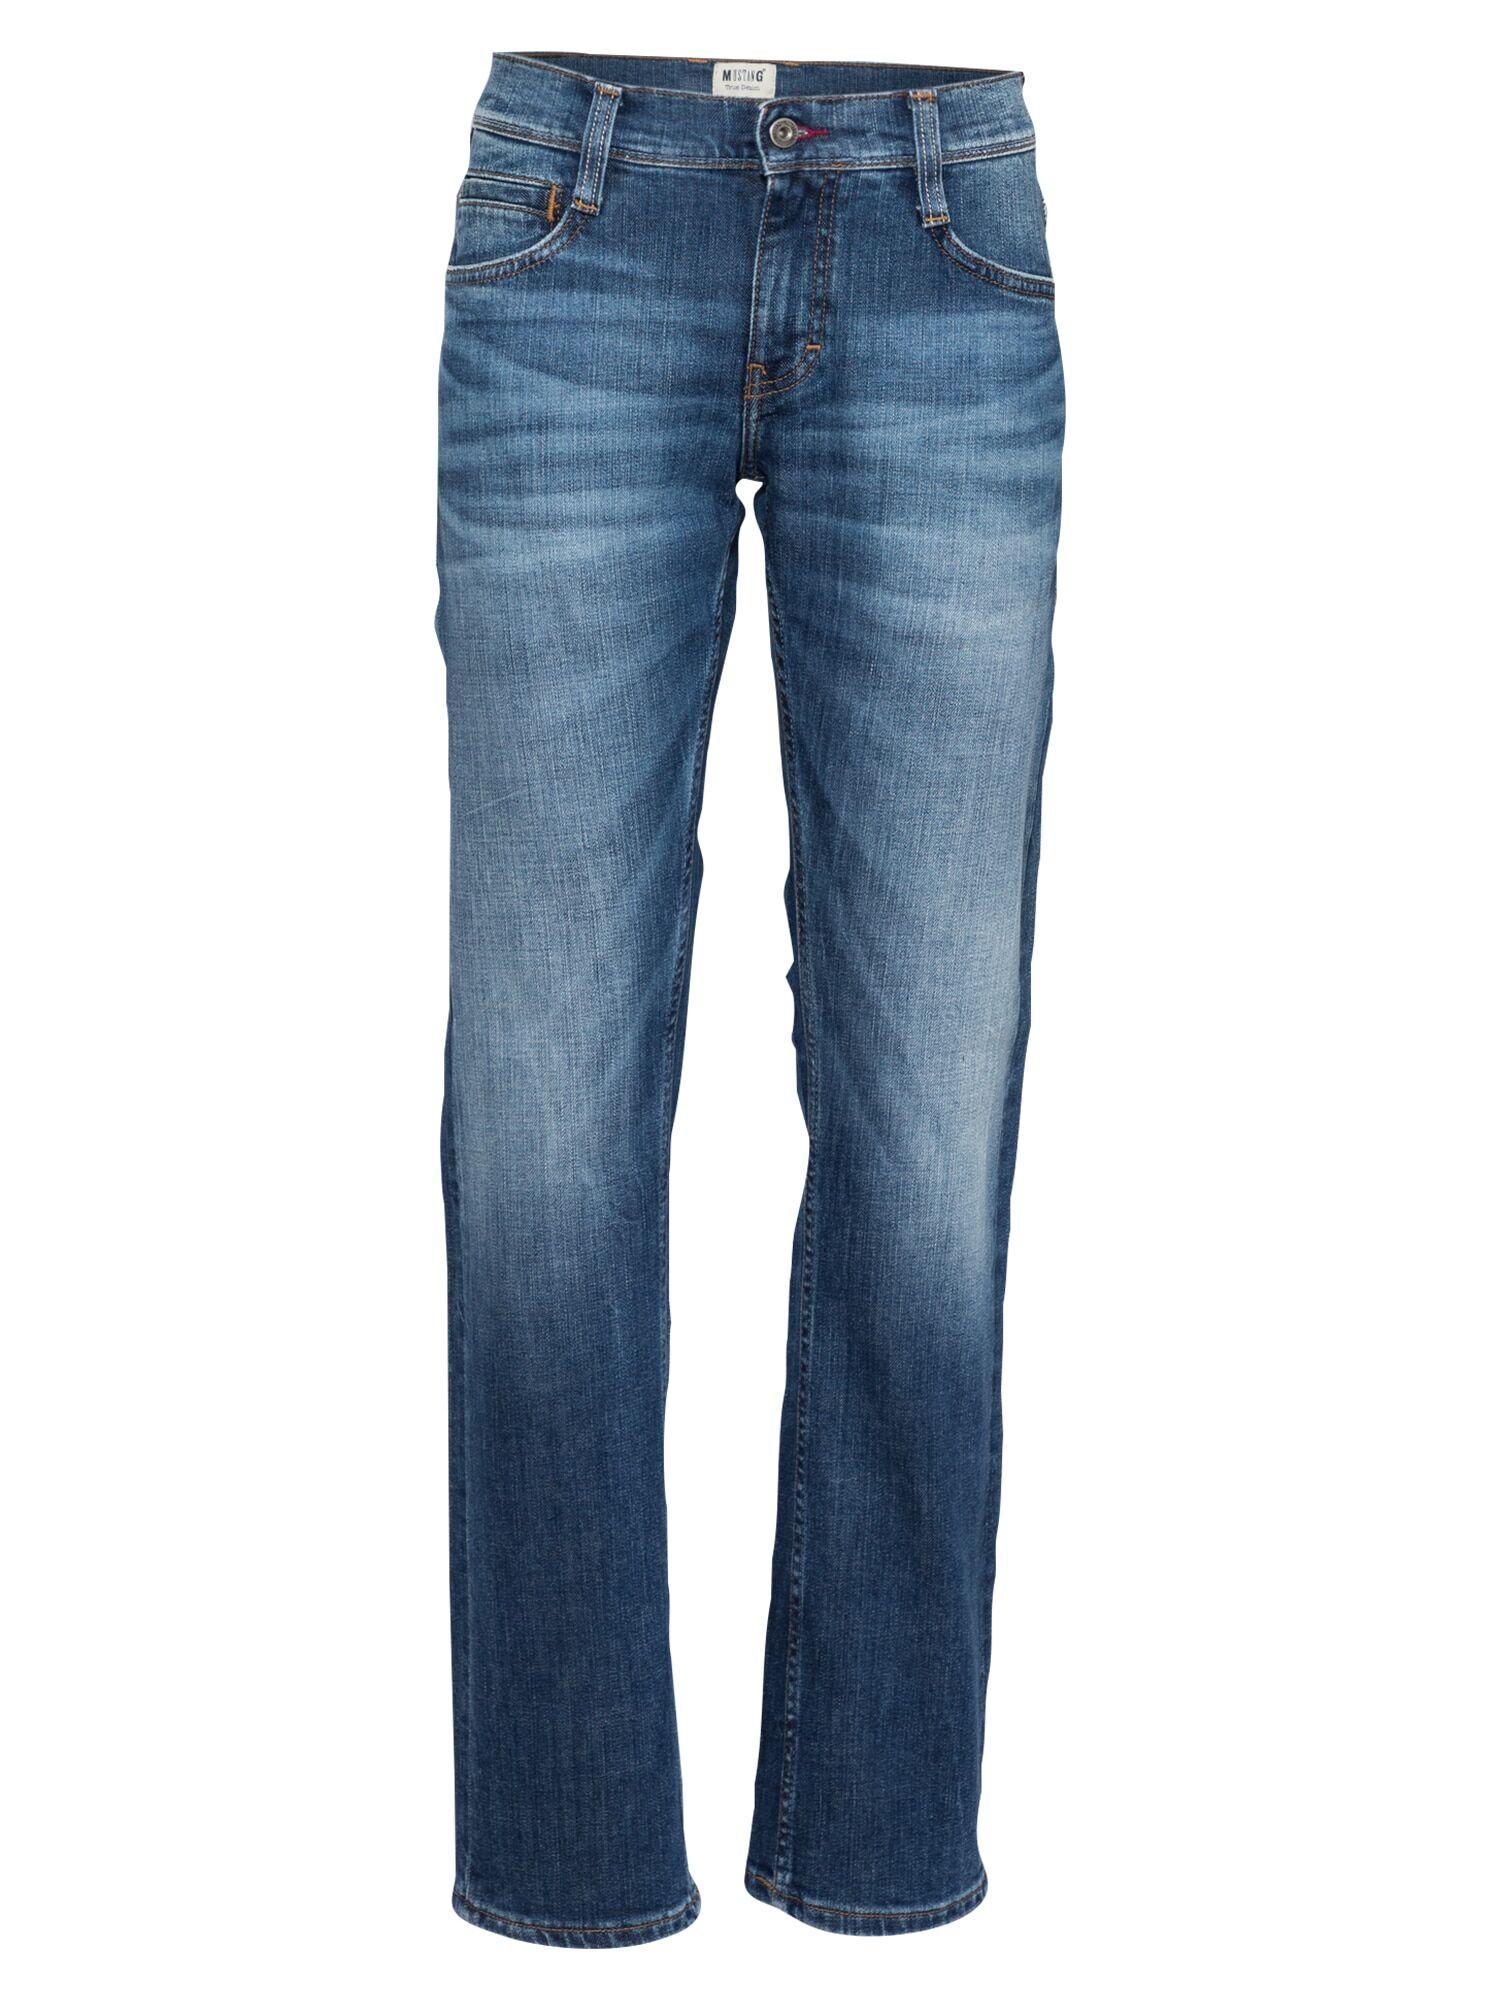 MUSTANG Jean 'Oregon '  - Bleu - Taille: 32/34 - male